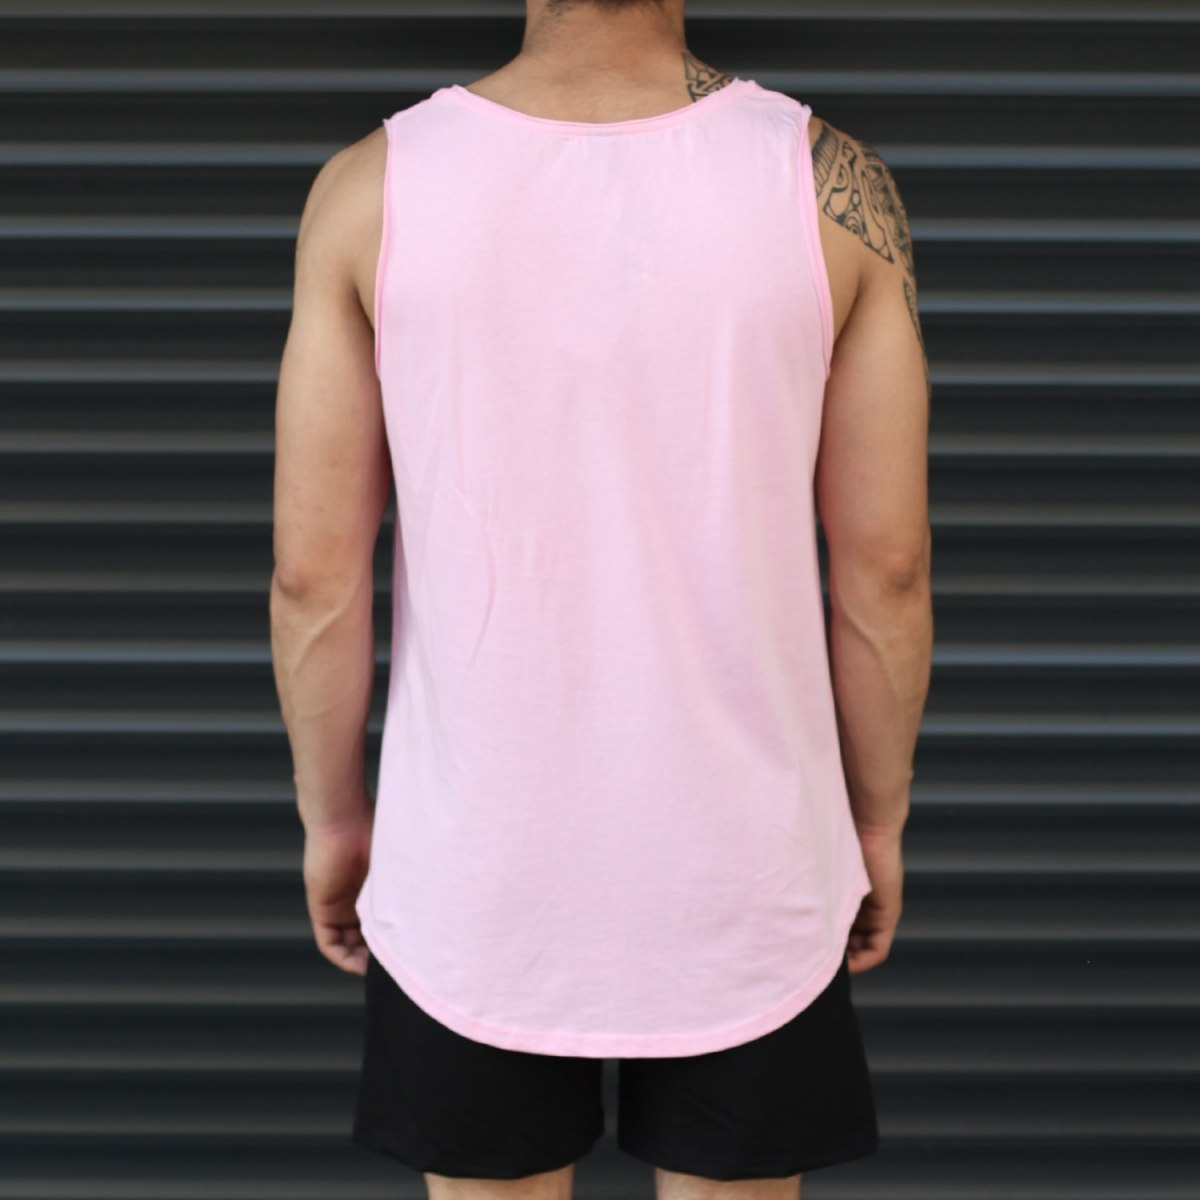 Men's Athletic Sleeveless Longling Tank Top Pink Mv Premium Brand - 3